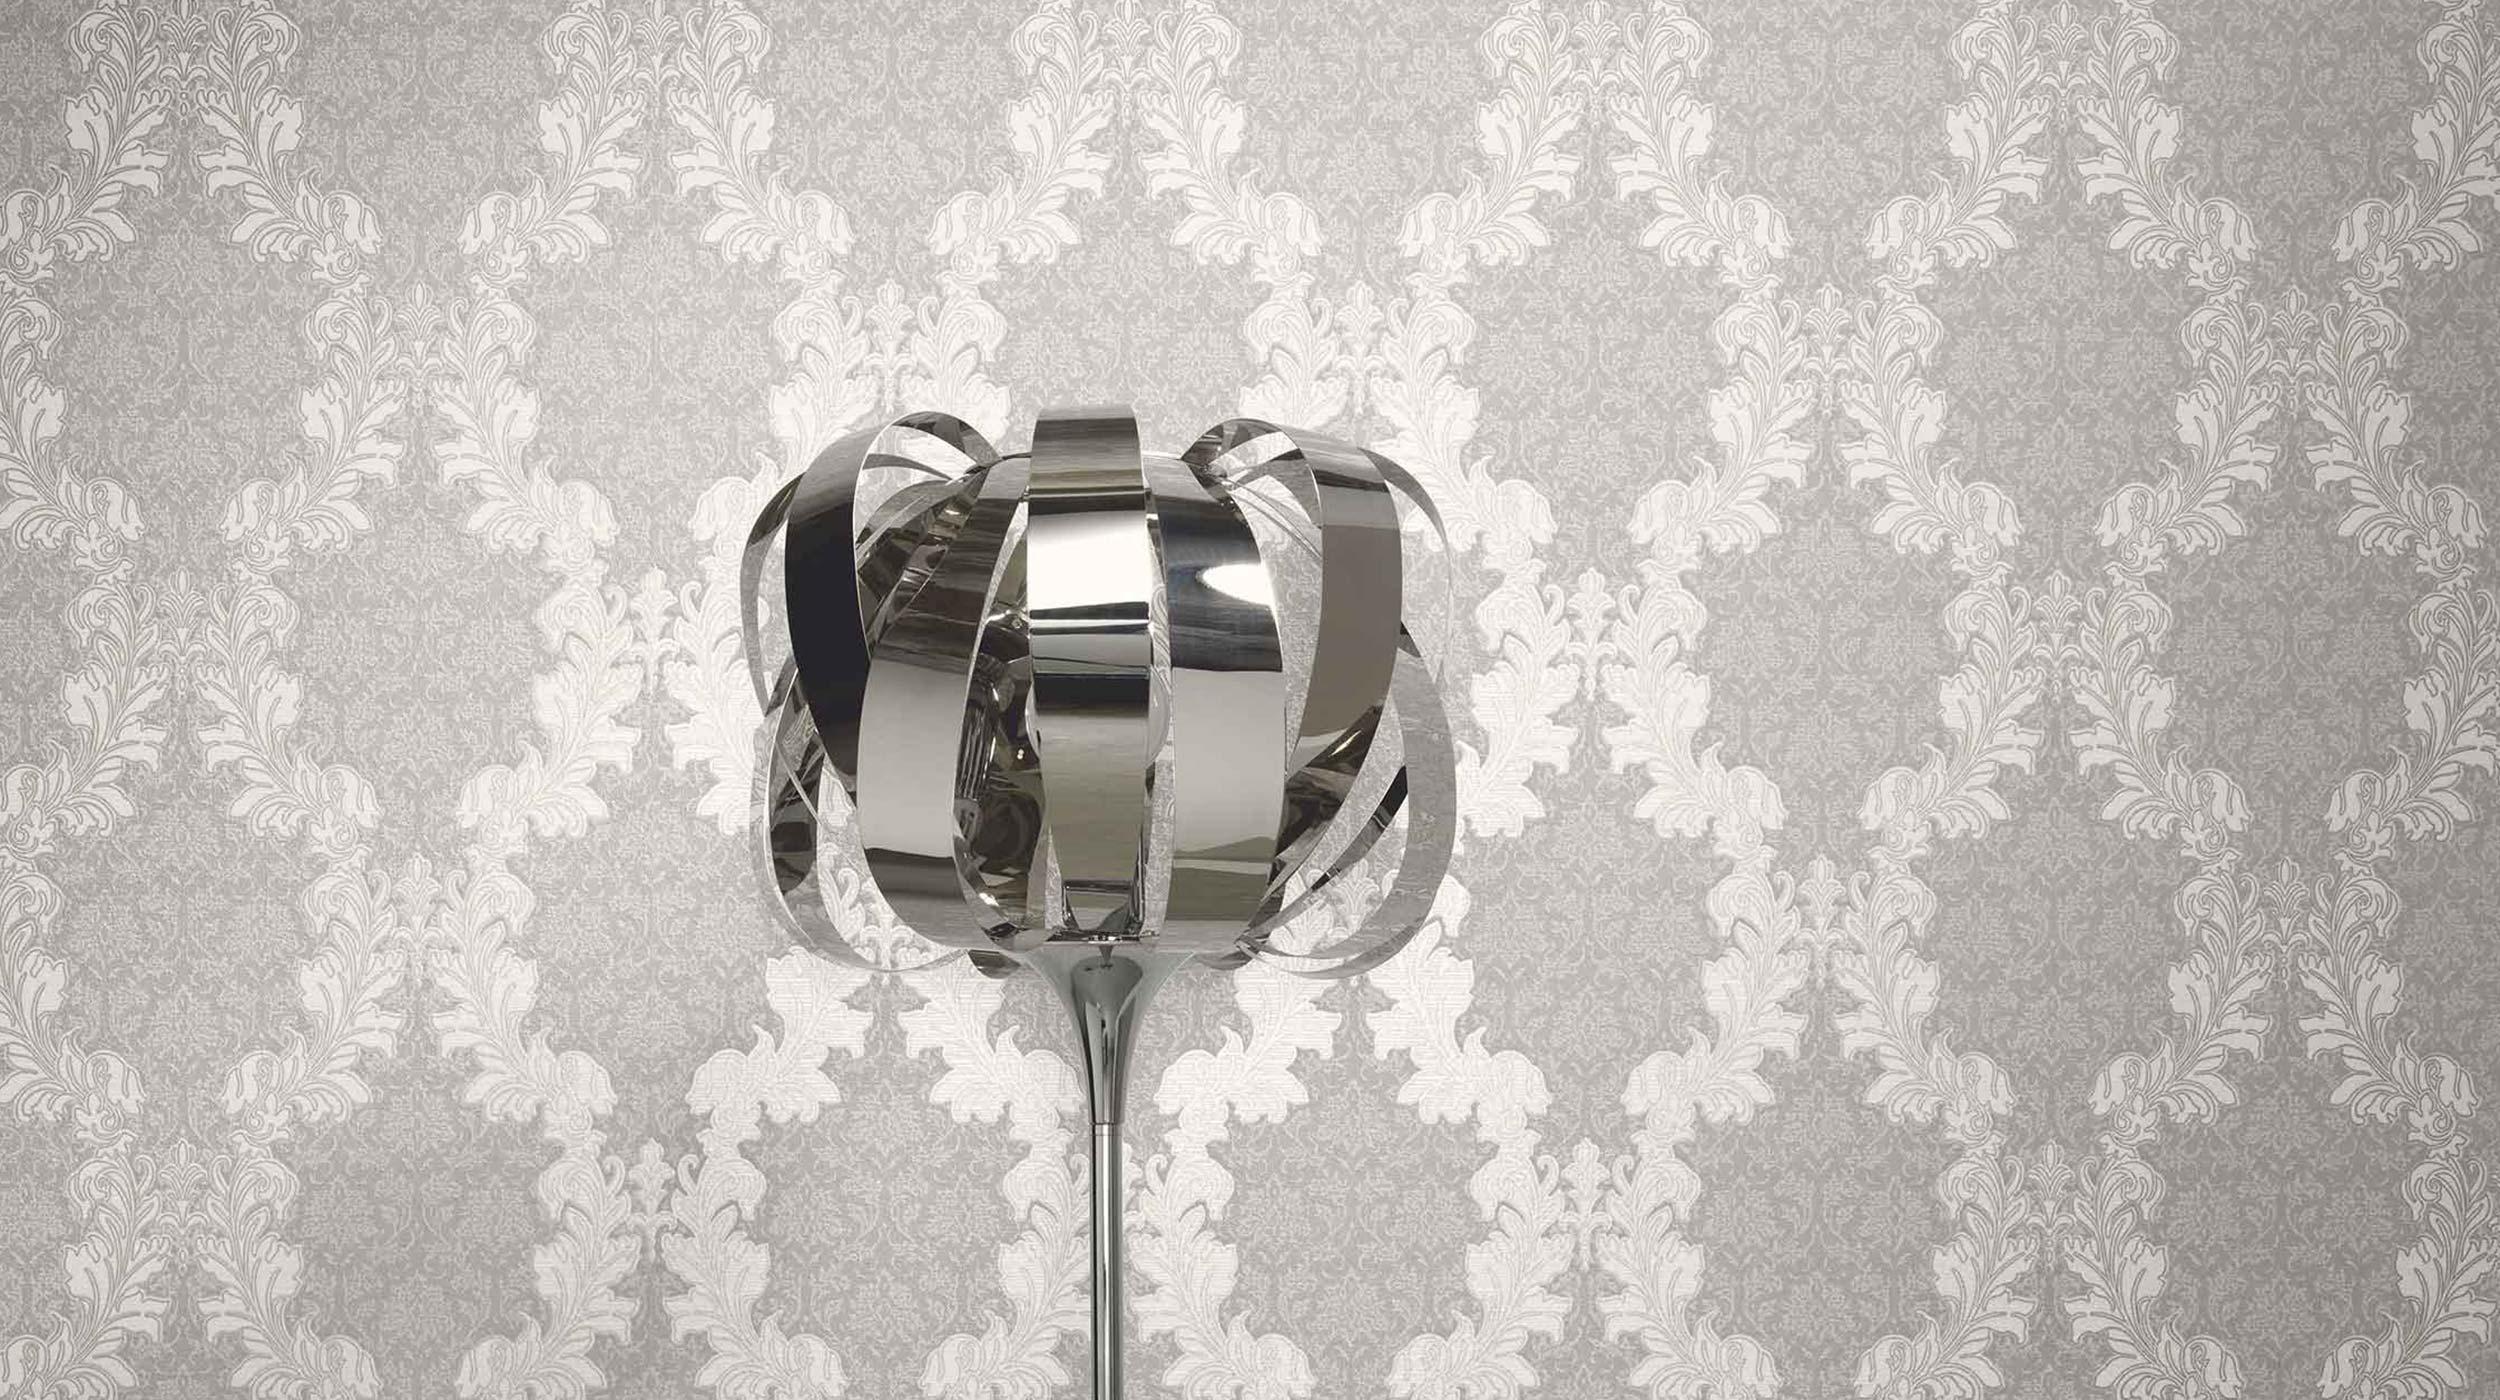 designer tapete ornament altea 478 erismann cie gmbh. Black Bedroom Furniture Sets. Home Design Ideas